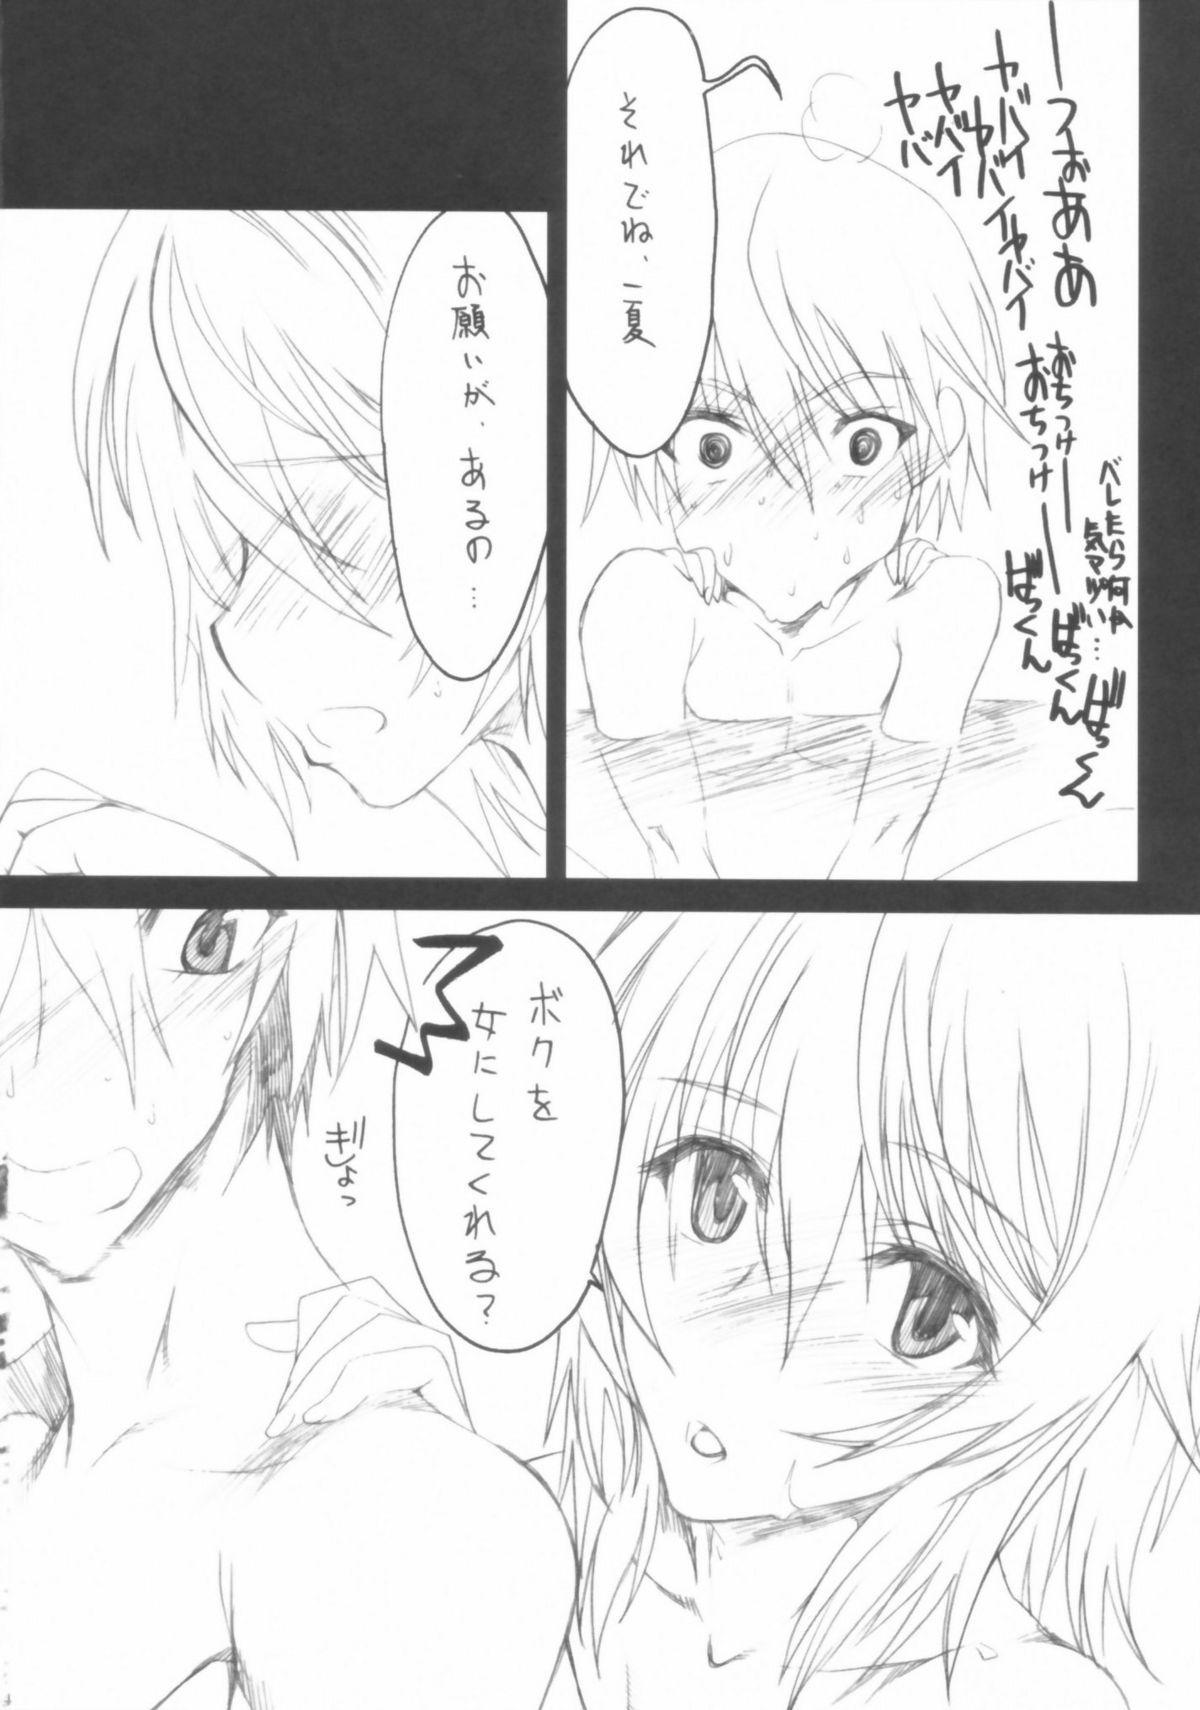 Ichibyou Kiss 3